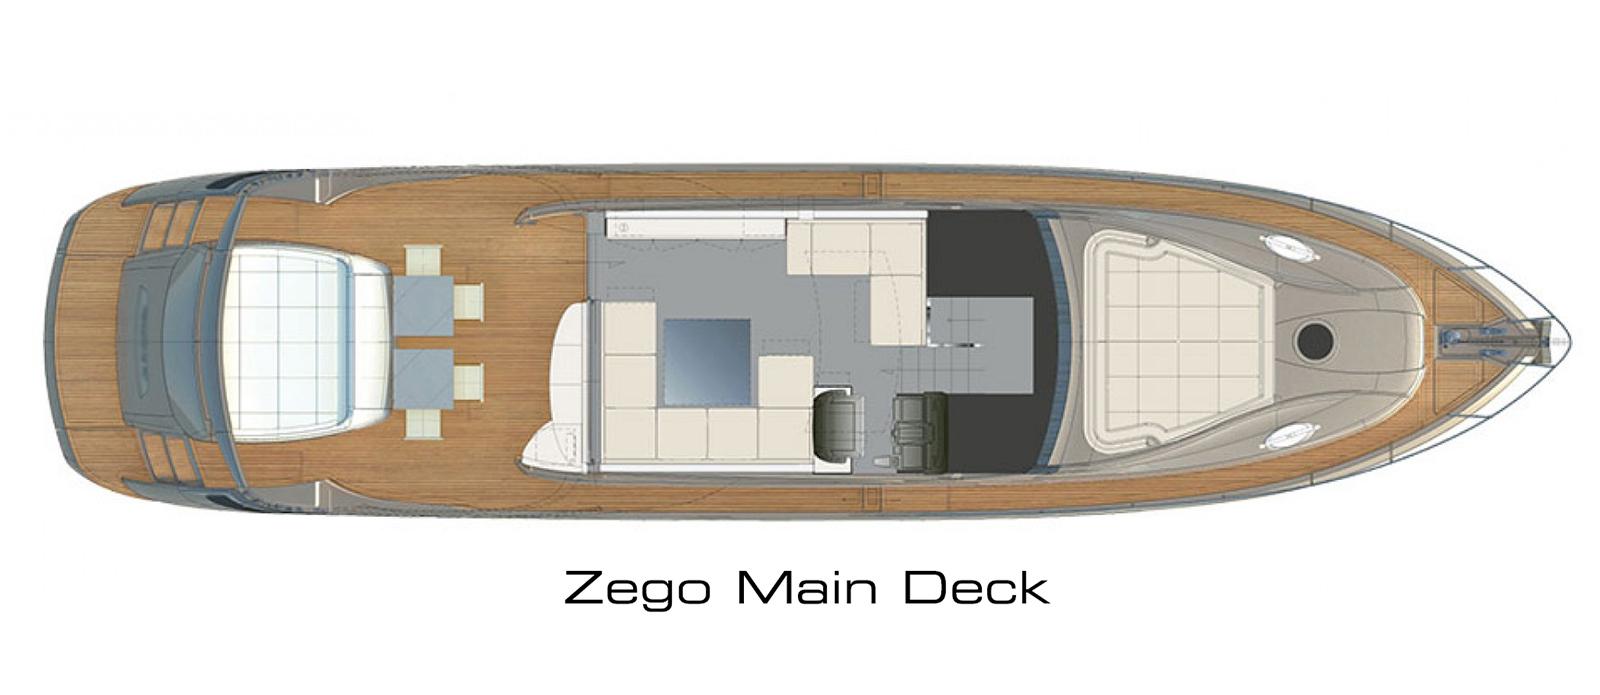 Pershing 70 Main Deck